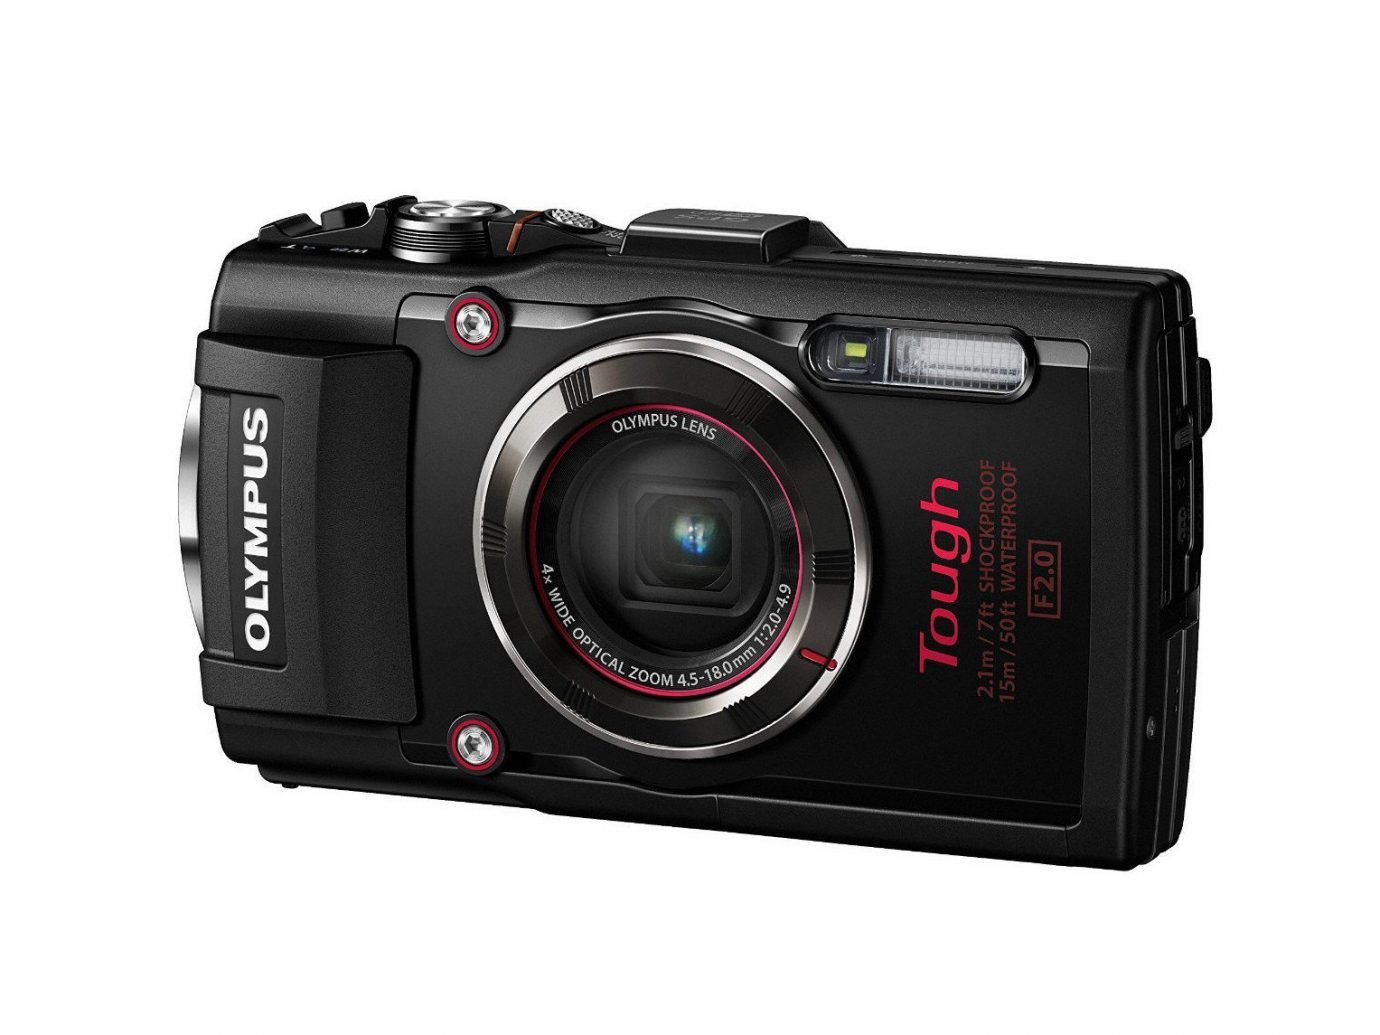 Travel Tips electronics digital camera camera cameras & optics camera lens single lens reflex camera multimedia